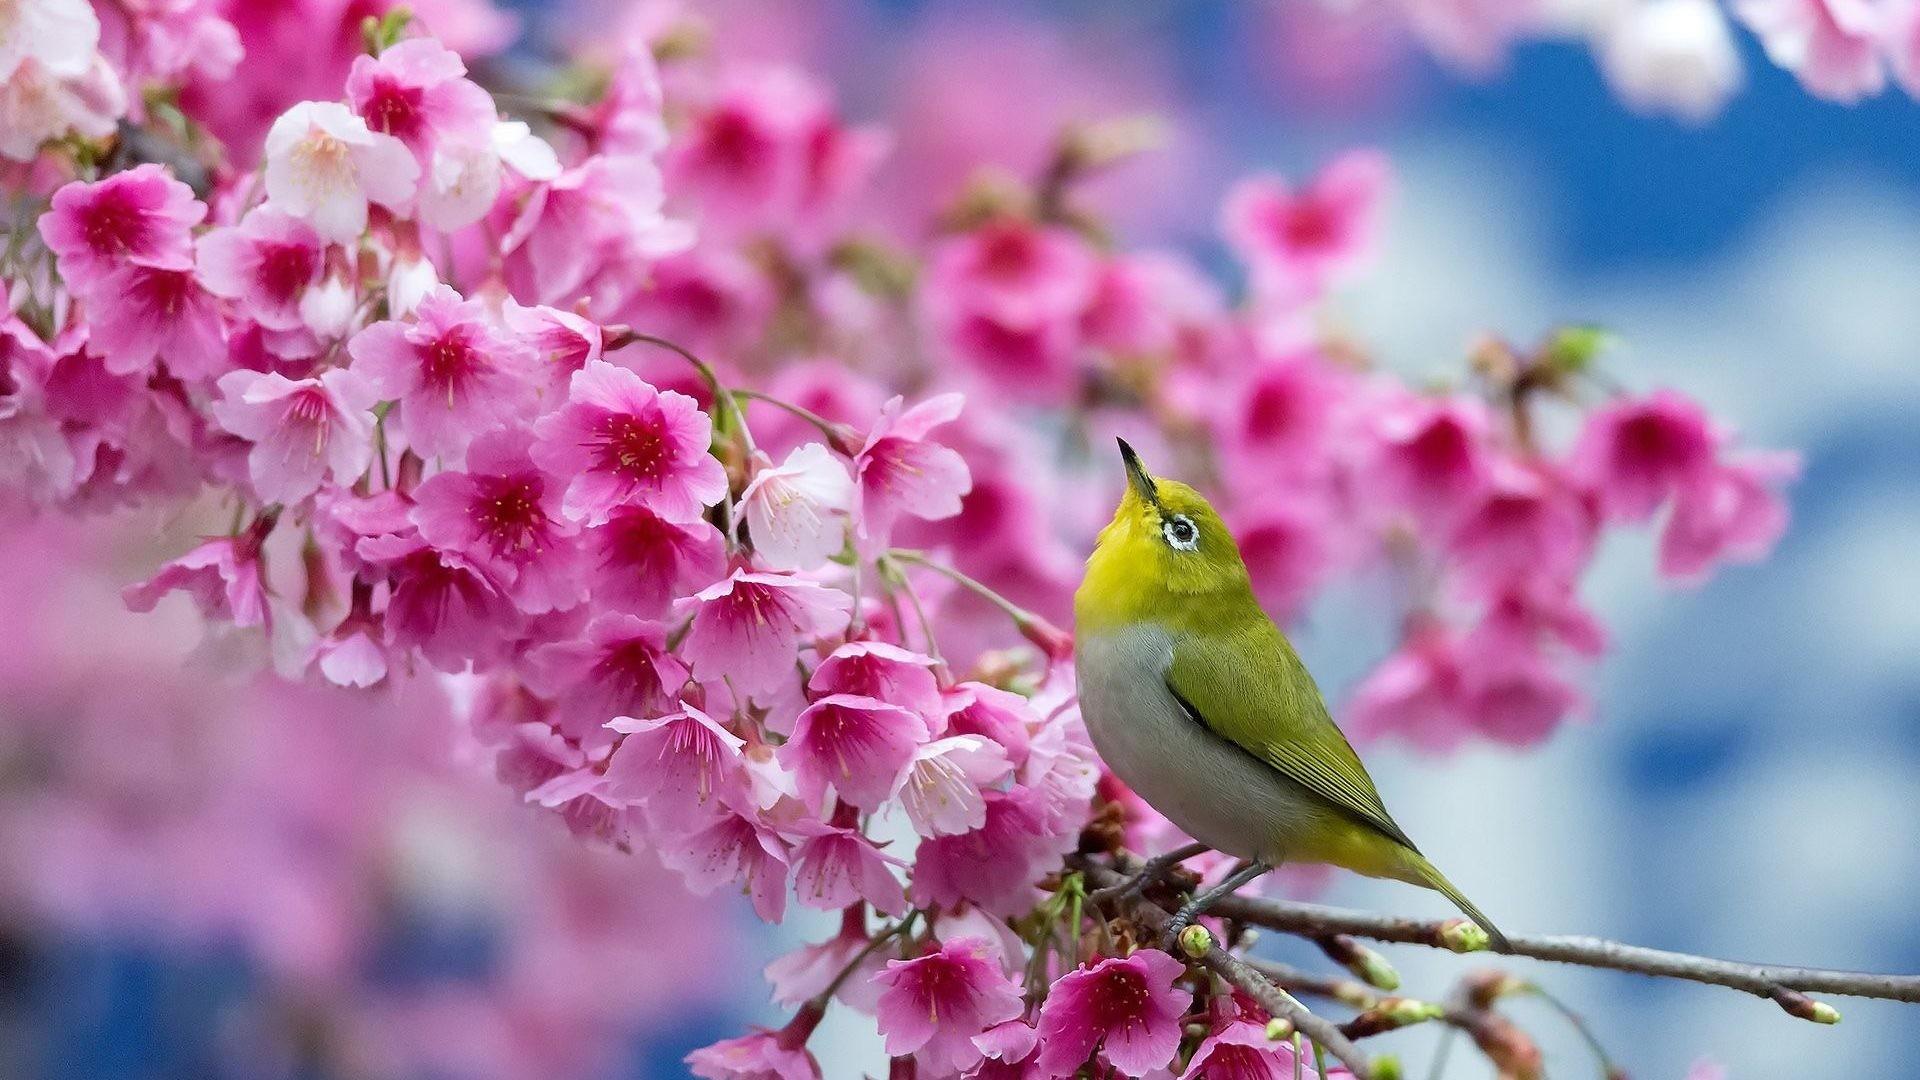 #224477 Color – Bird Flowers Flower Cherry Beauty Blossom Spring Branch Japanese  Wallpaper Photo Nature